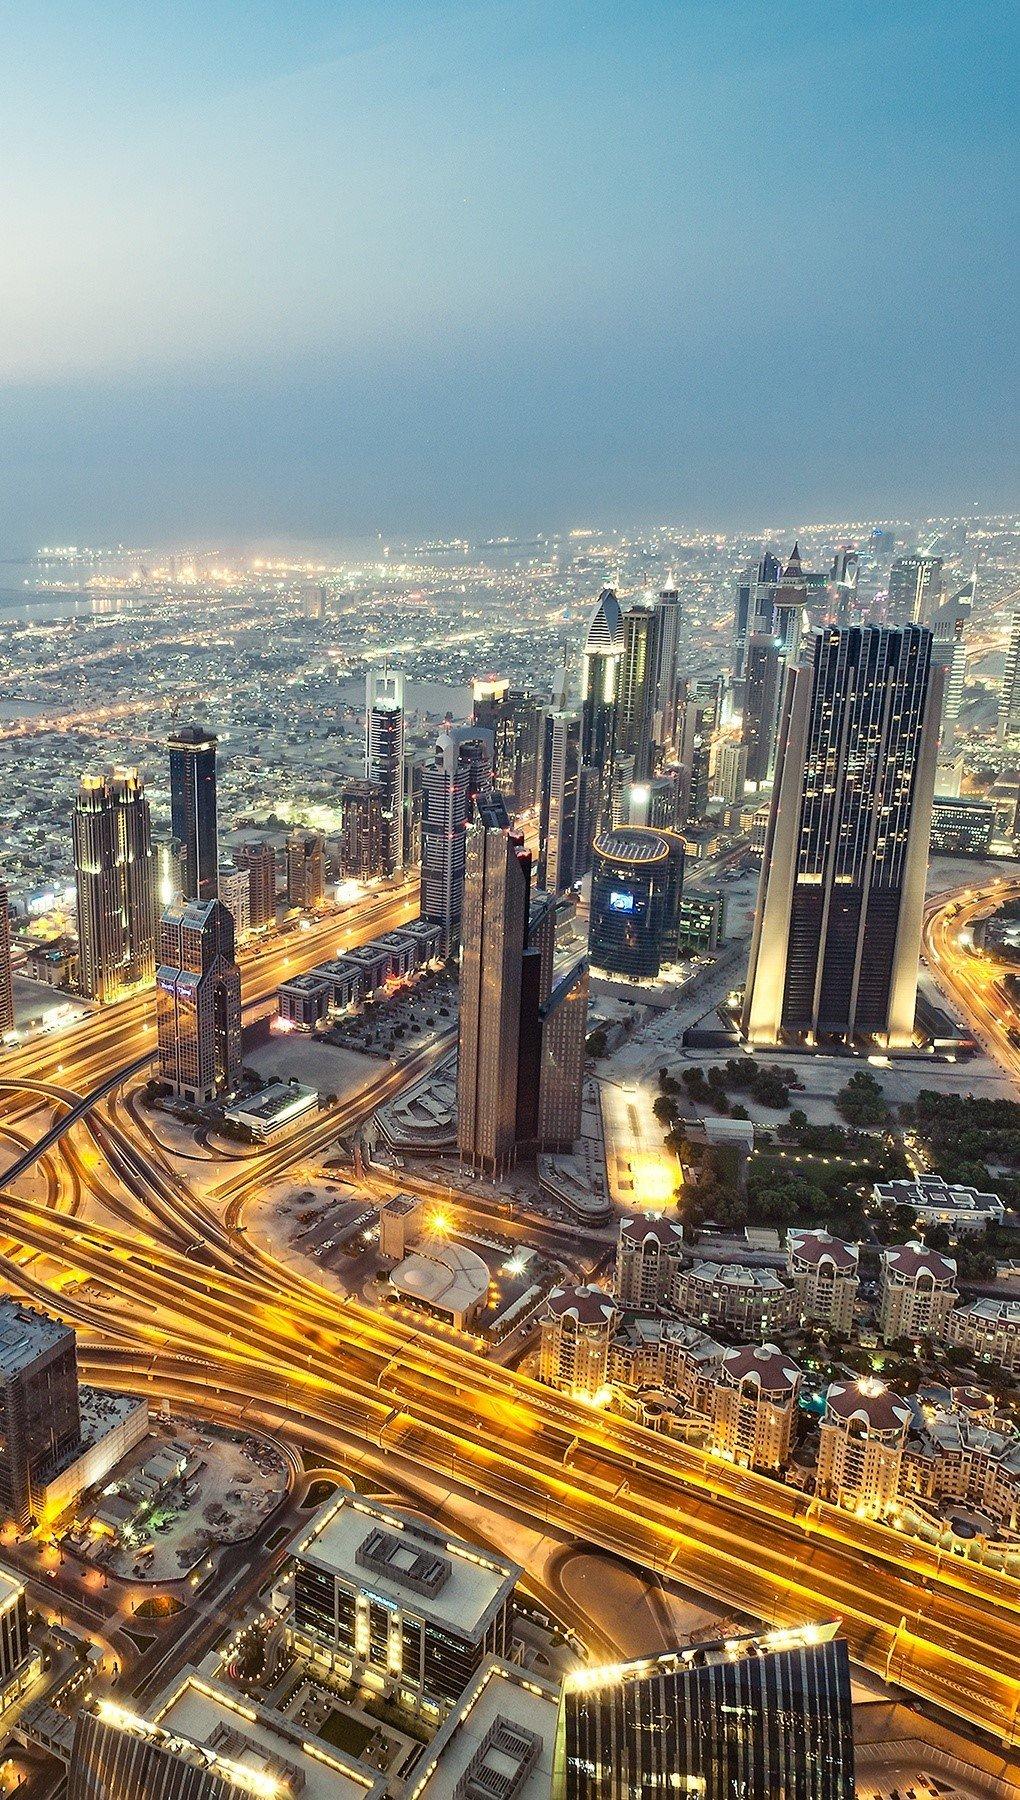 Wallpaper View from the Burj Khalifa skyscraper Vertical